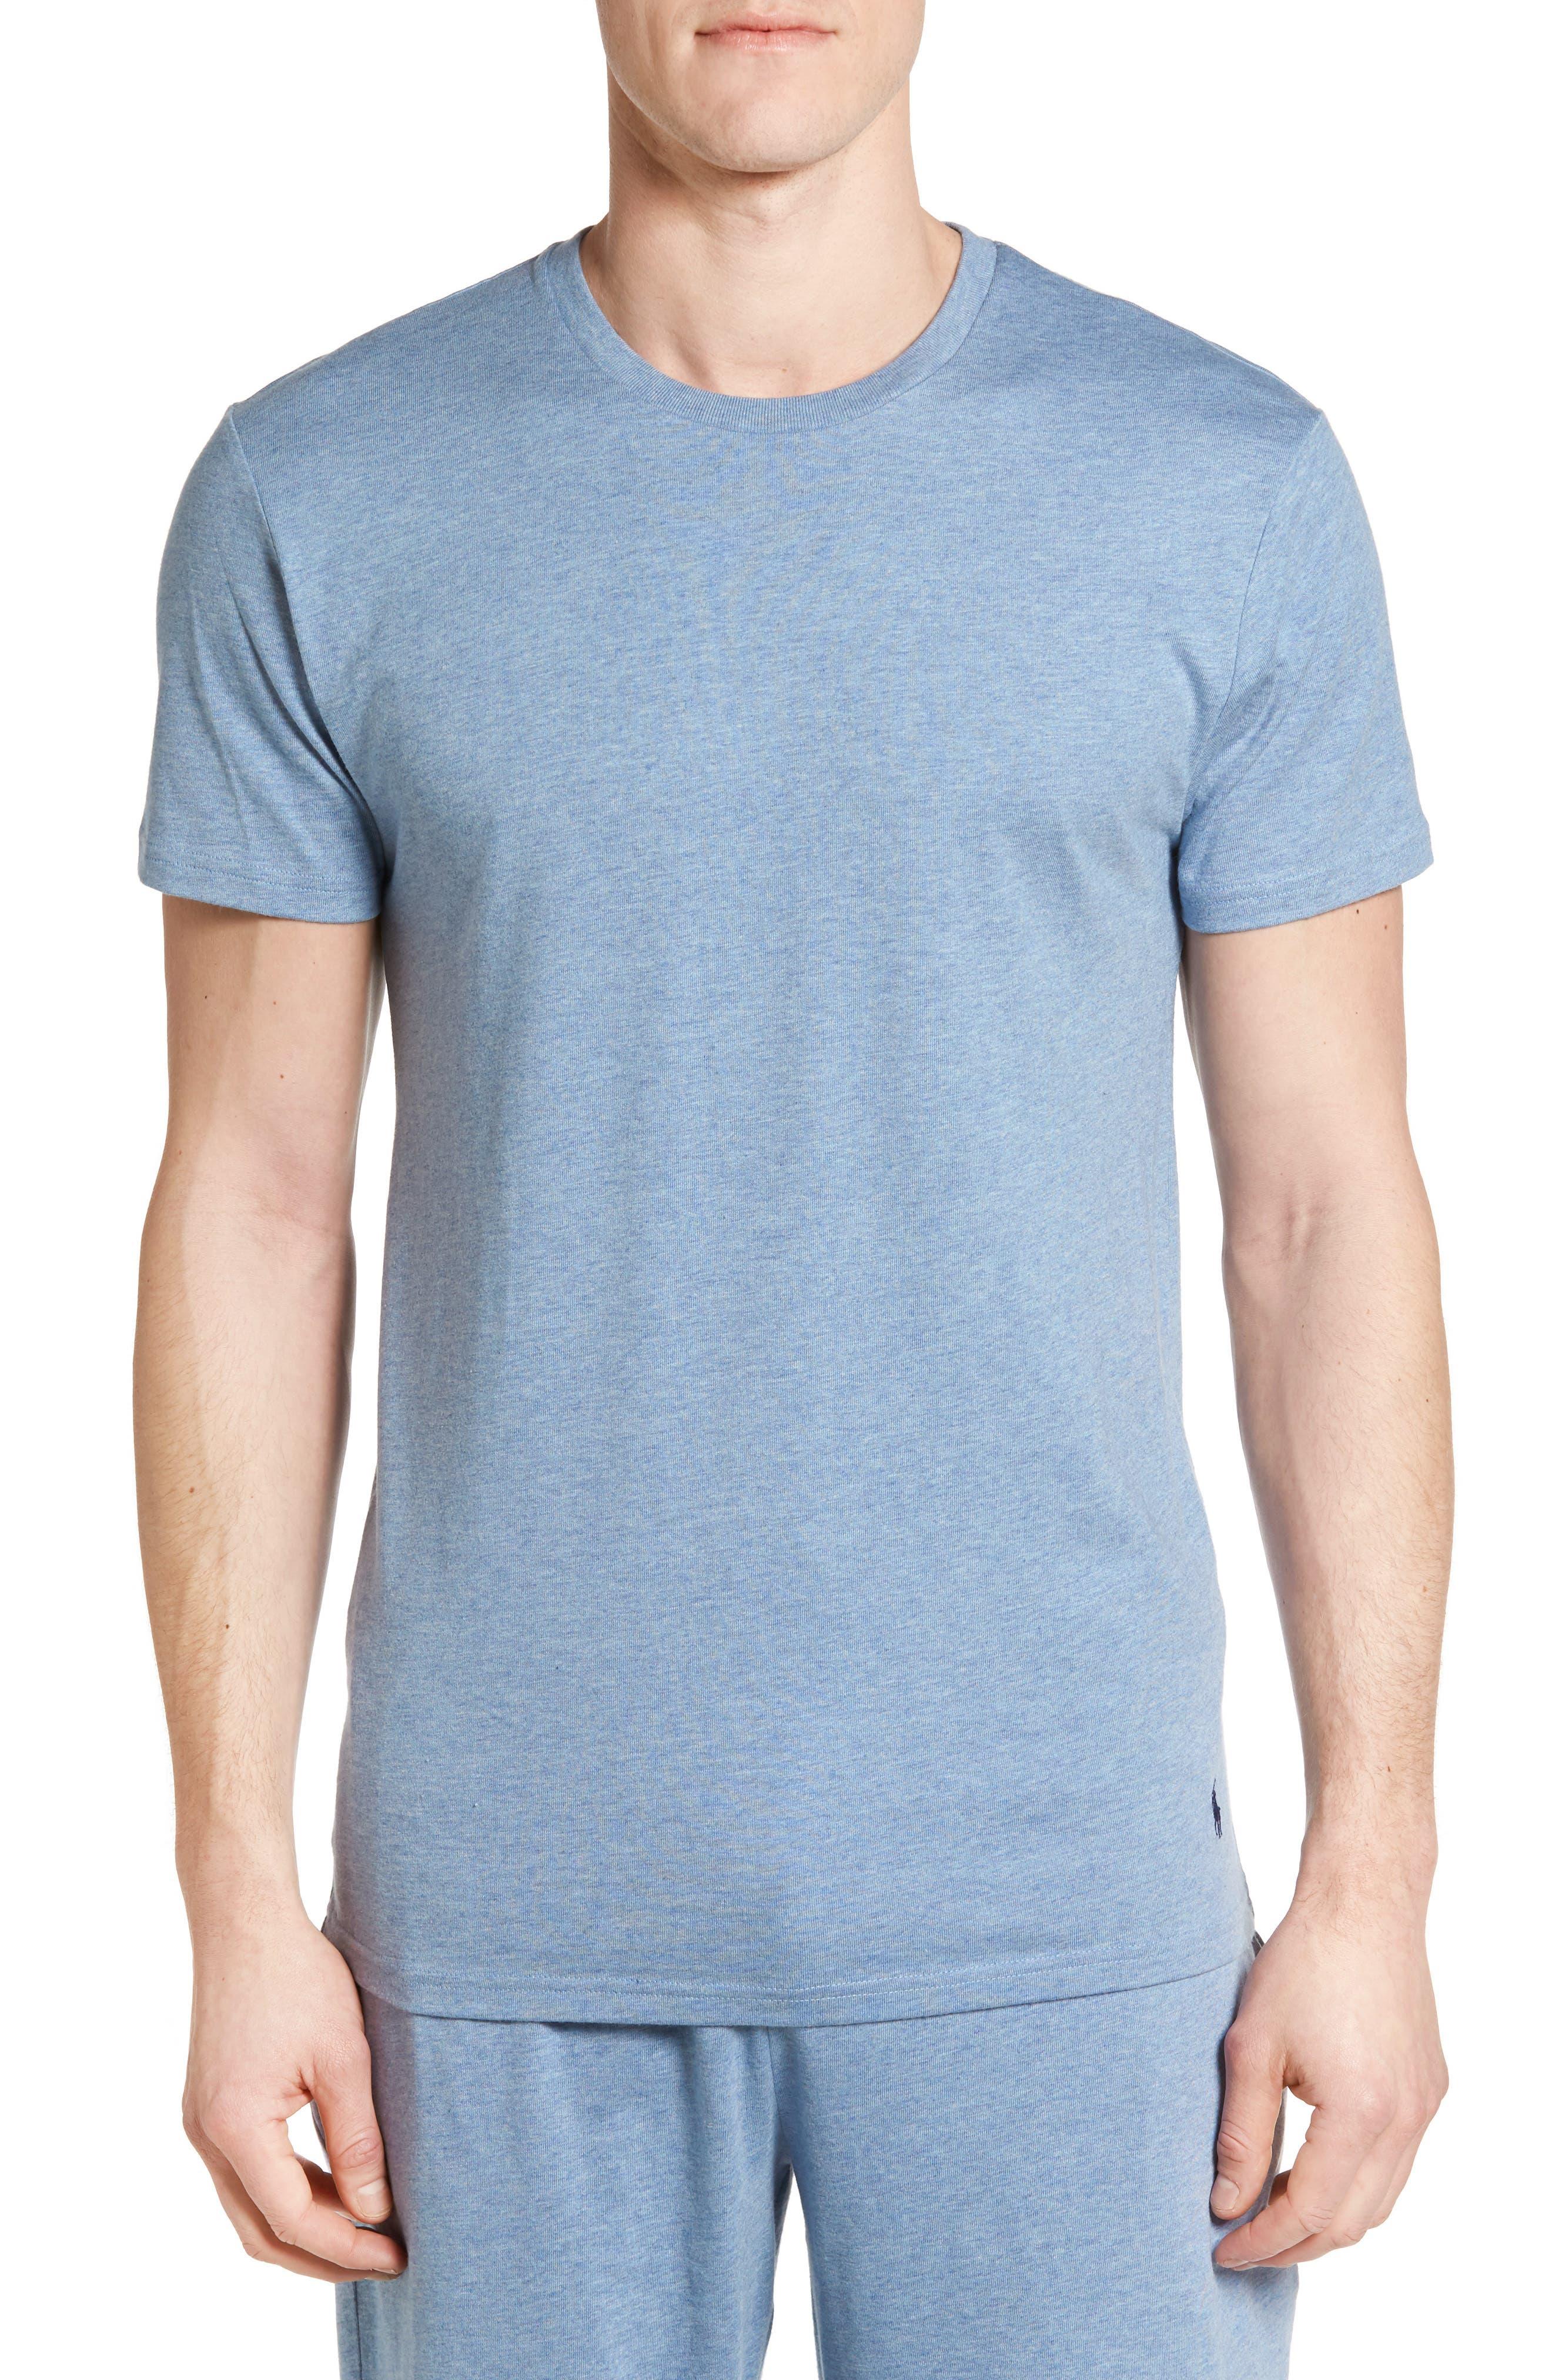 Main Image - Polo Ralph Lauren Crewneck Cotton & Modal T-Shirt